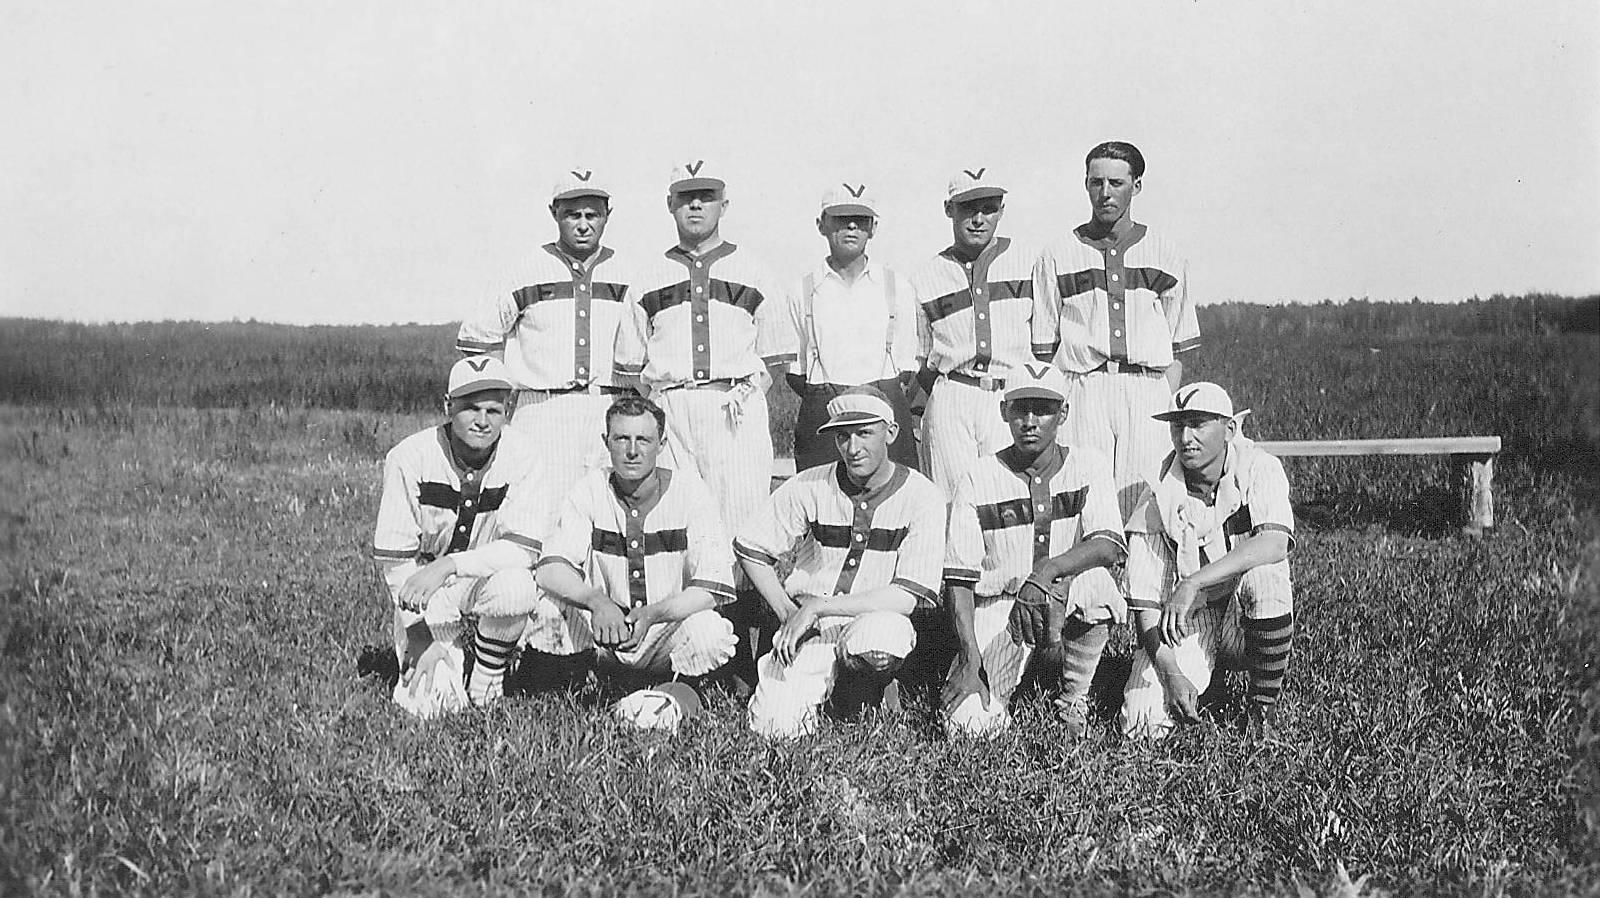 "Fort Vermilion mens Soft ball team of 1933. Back Row: CJ Kidd, Norman Henry, Joe Kemp, W.S. ""Bill""Carson, George Scott.  Front Row: Harry Borbridge, Bill Hill, Dr Harold Hamman, Manny Charles, Fred Dembiski.  1998.05.23.183 / Lamberton, Rev Hugh and Lillian"